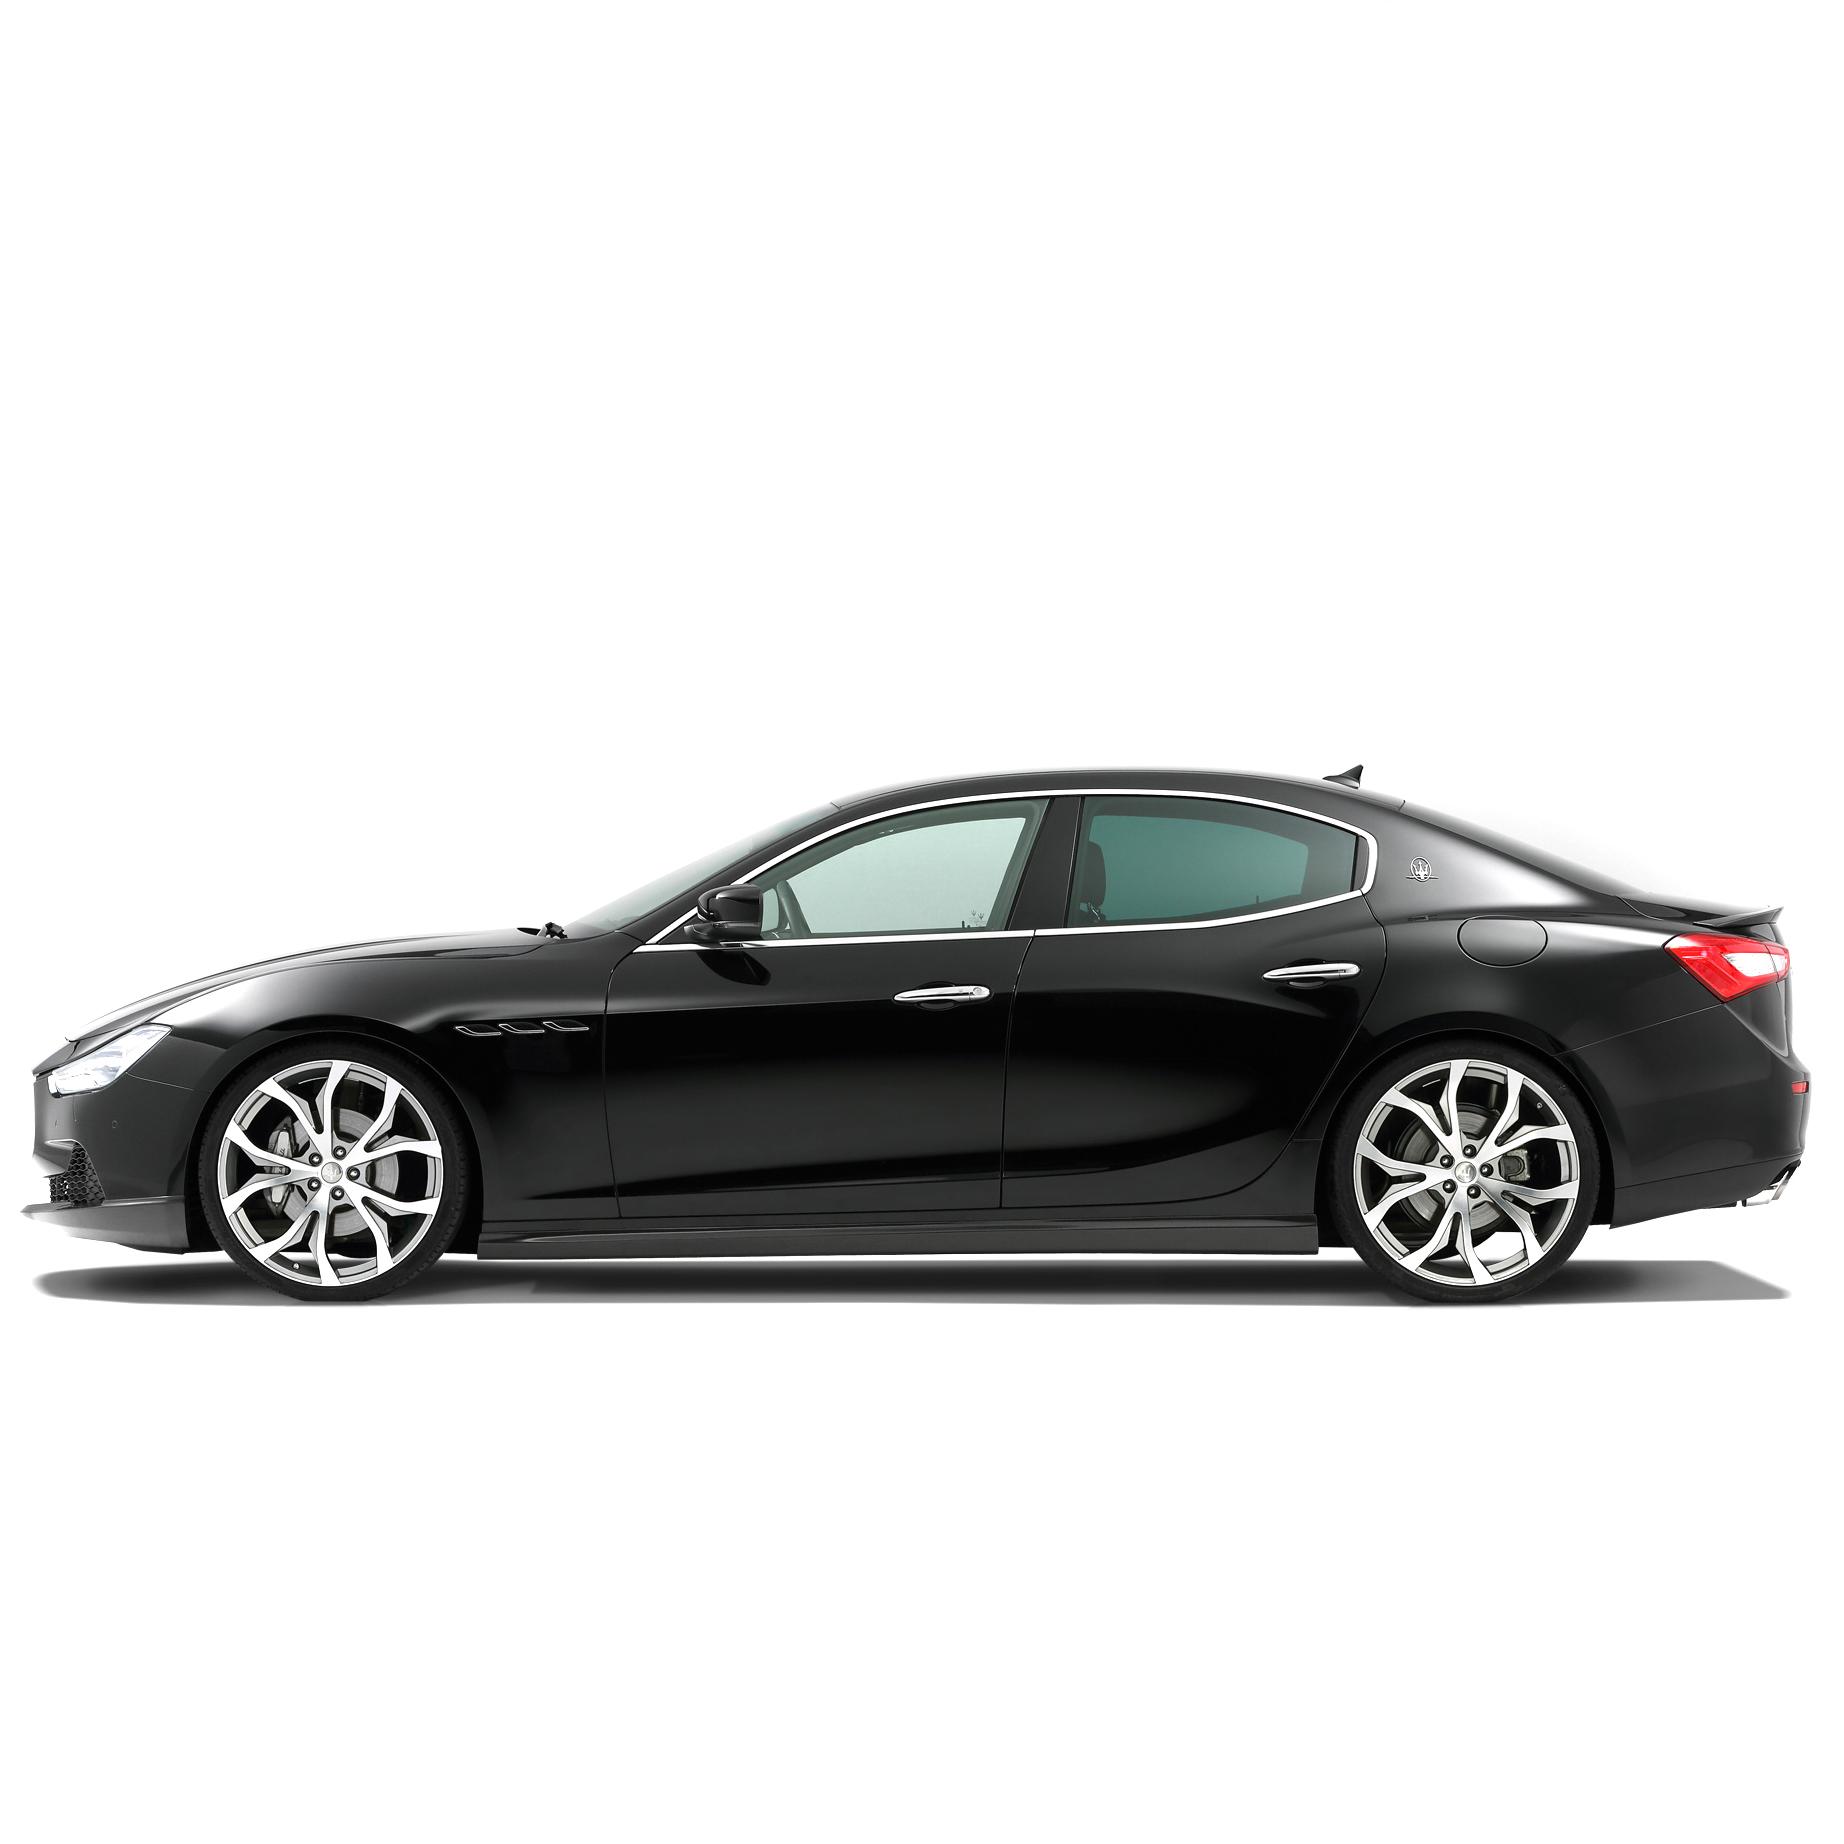 Maserati Ghibli 2014 Onwards